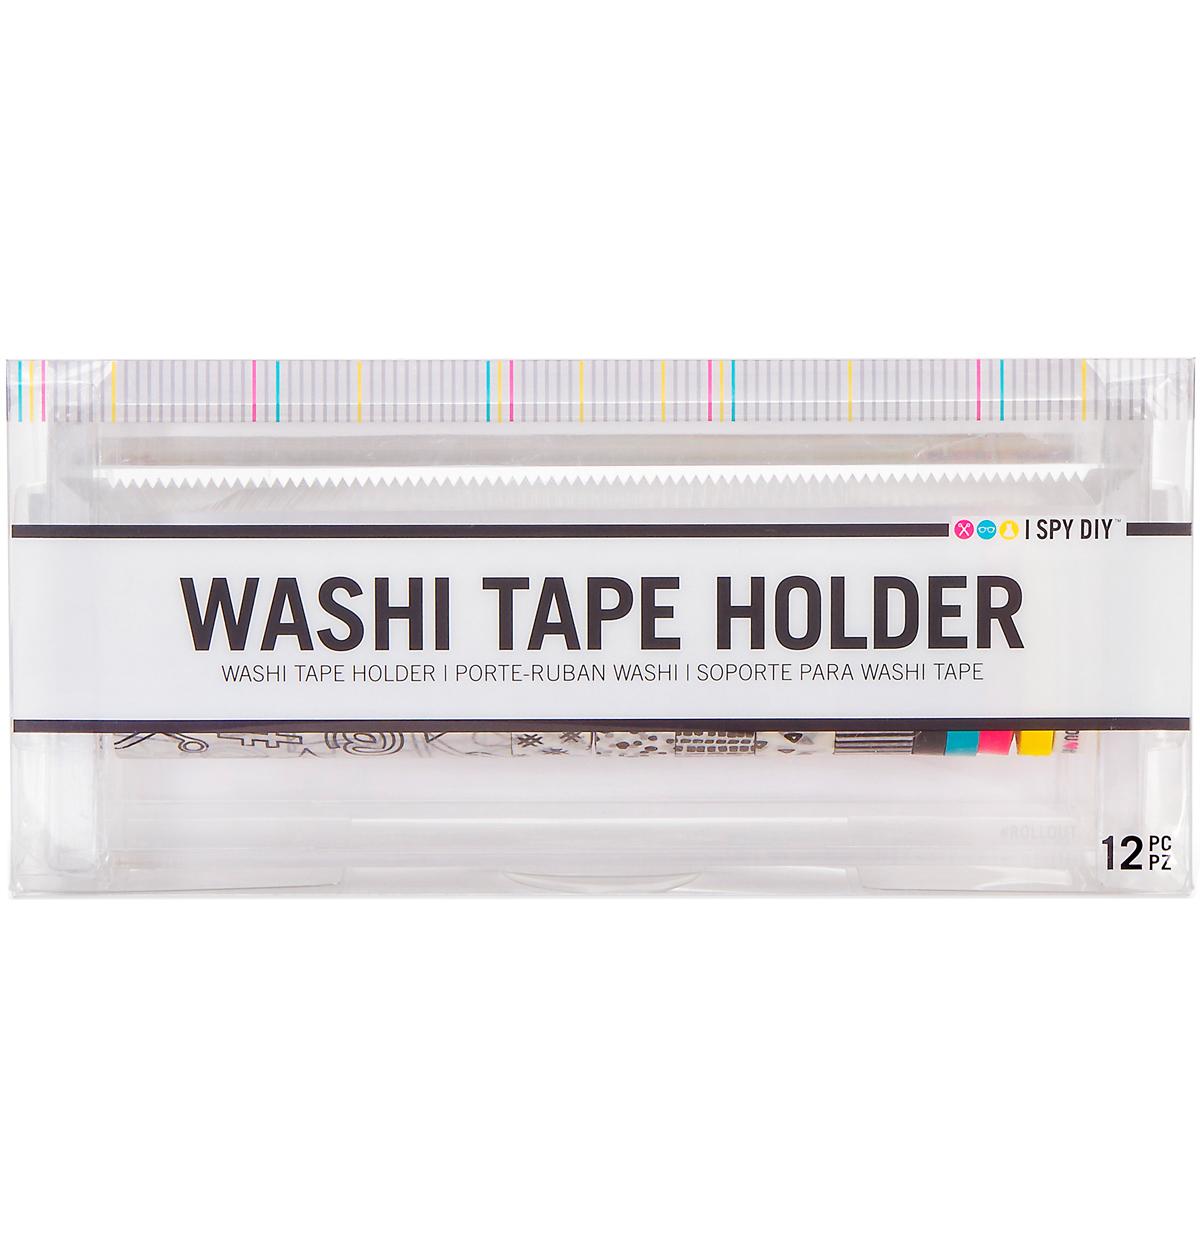 "I Spy Diy Acrylic Washi Tape Dispenser W/11 Rolls-Clear, 8.75""X4""X3.5"" - image 1 of 1"